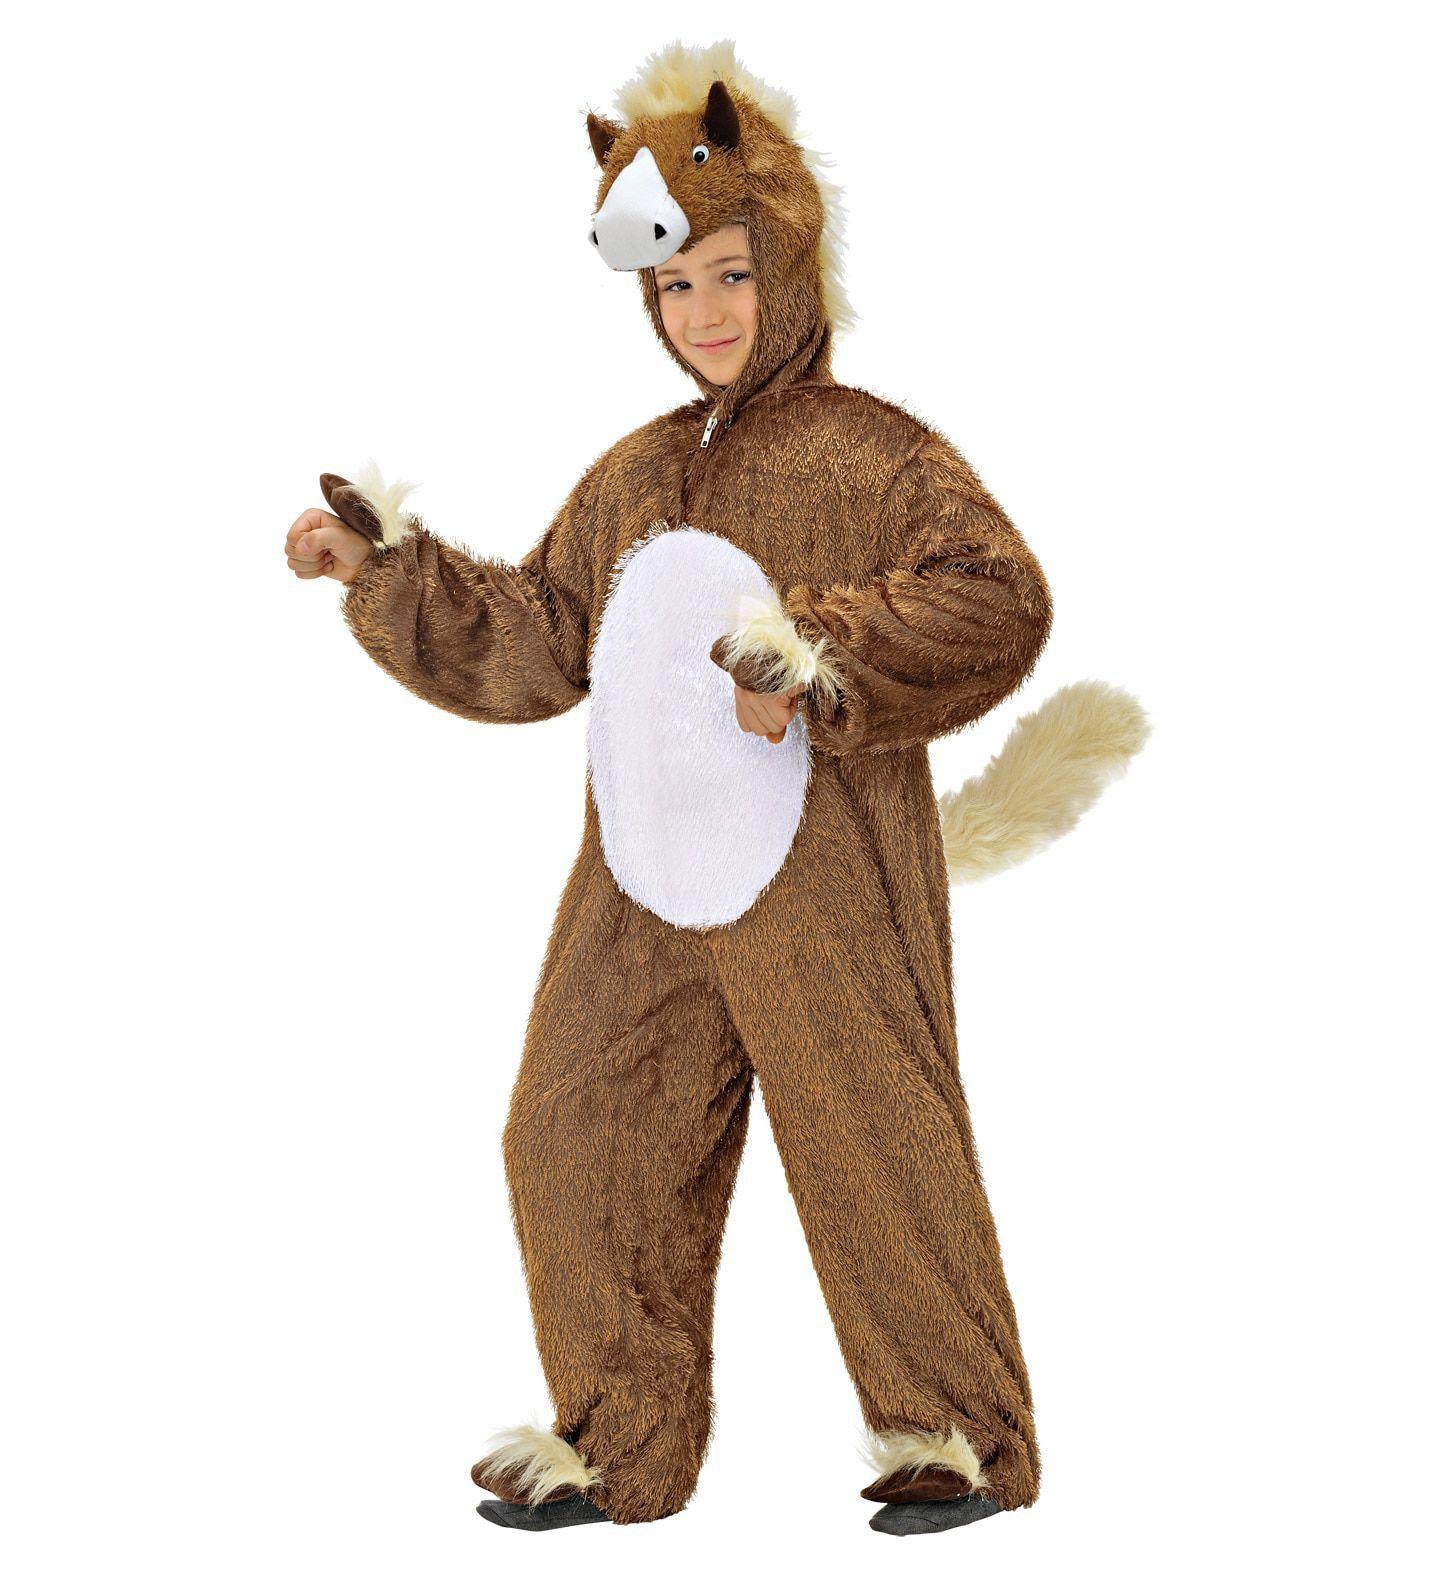 Full-Body Pluche Paard Kind Kostuum